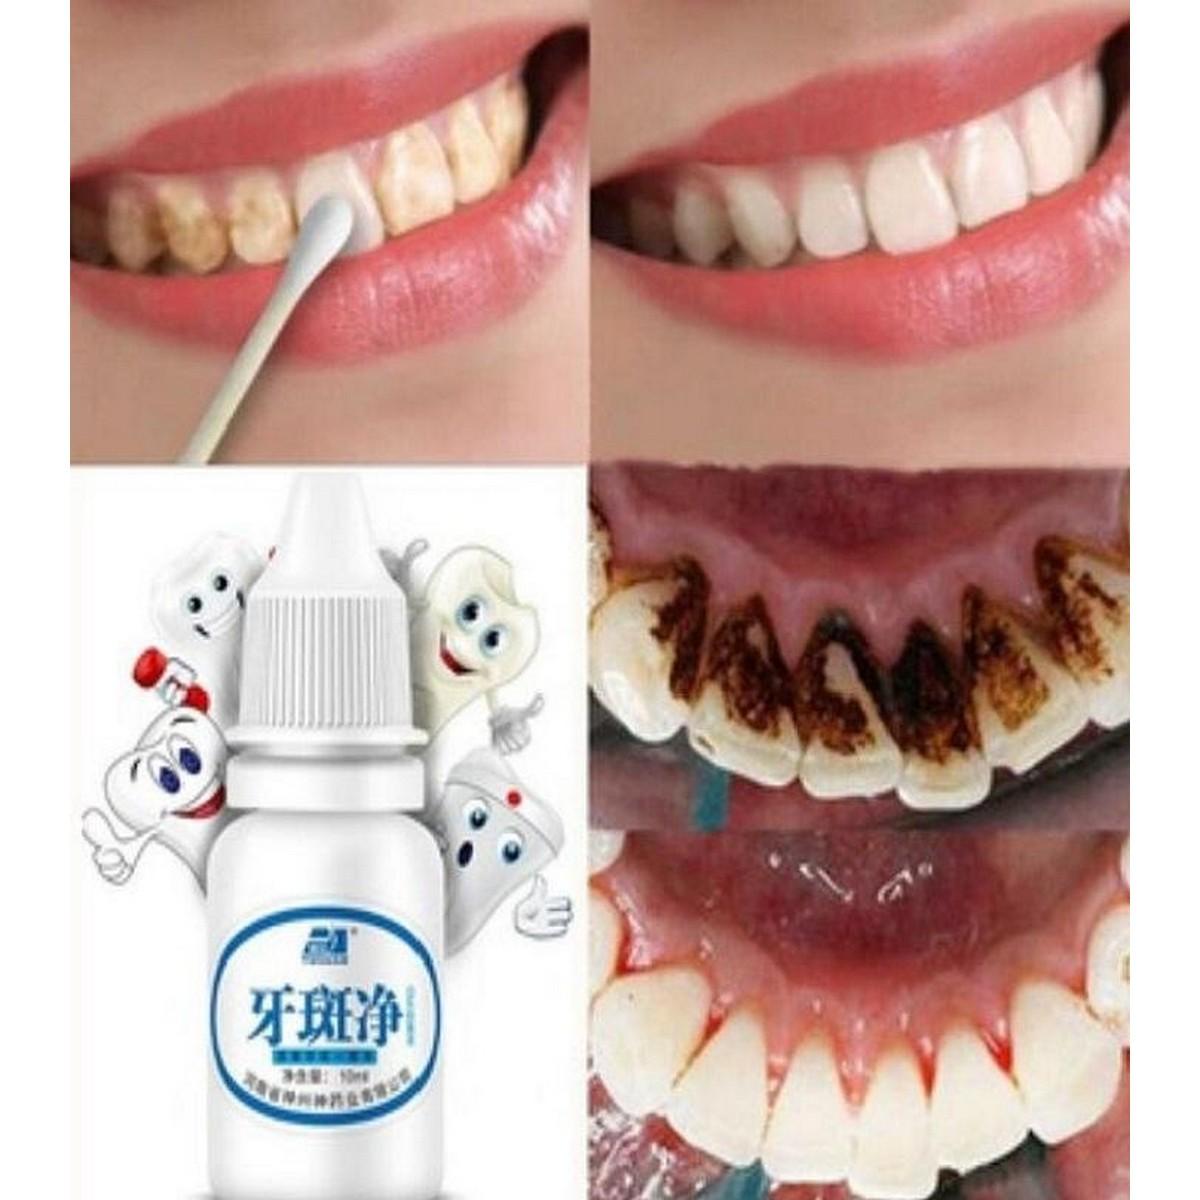 10ml Teeth Whitening Water Oral Hygiene Cleaning Teeth Care Tooth Cleaning Whitening Water